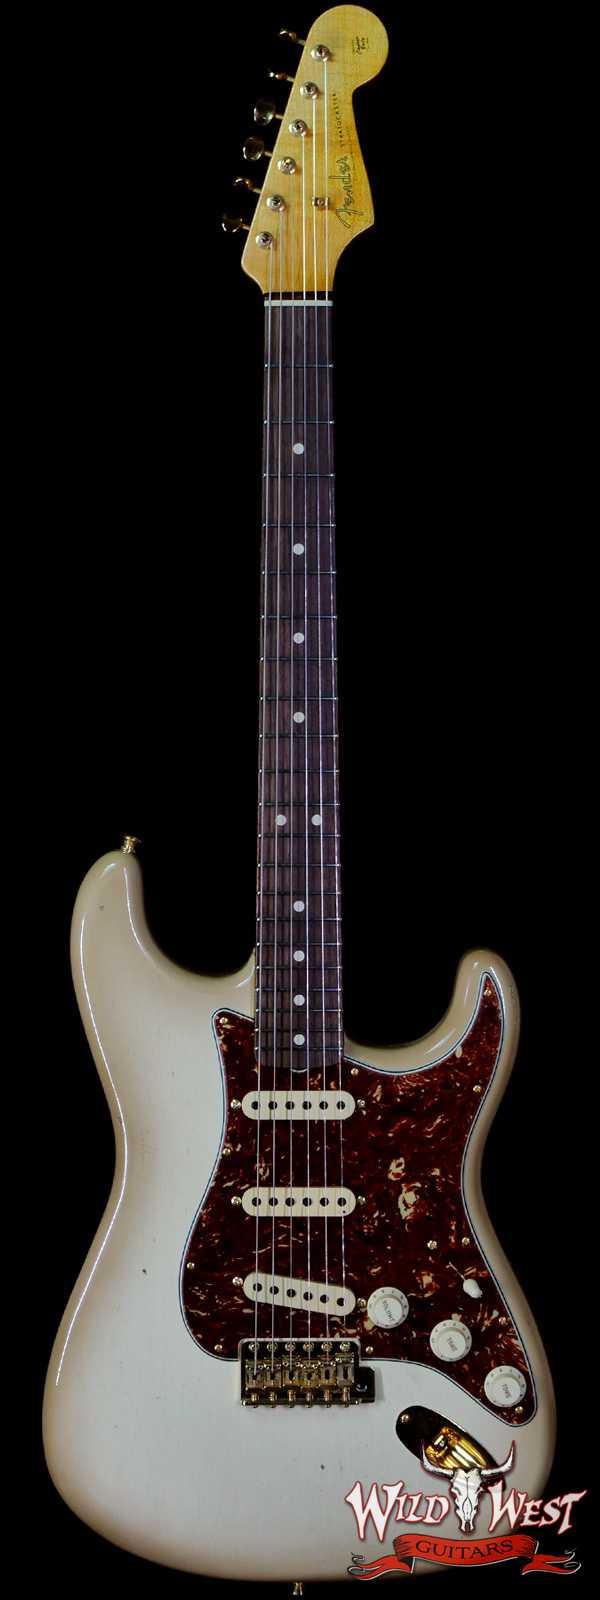 Fender Custom Shop Yuriy Shishkov Masterbuilt 60's Stratocaster Josefina Hand-Wound Pickups Journeyman Relic Antigua